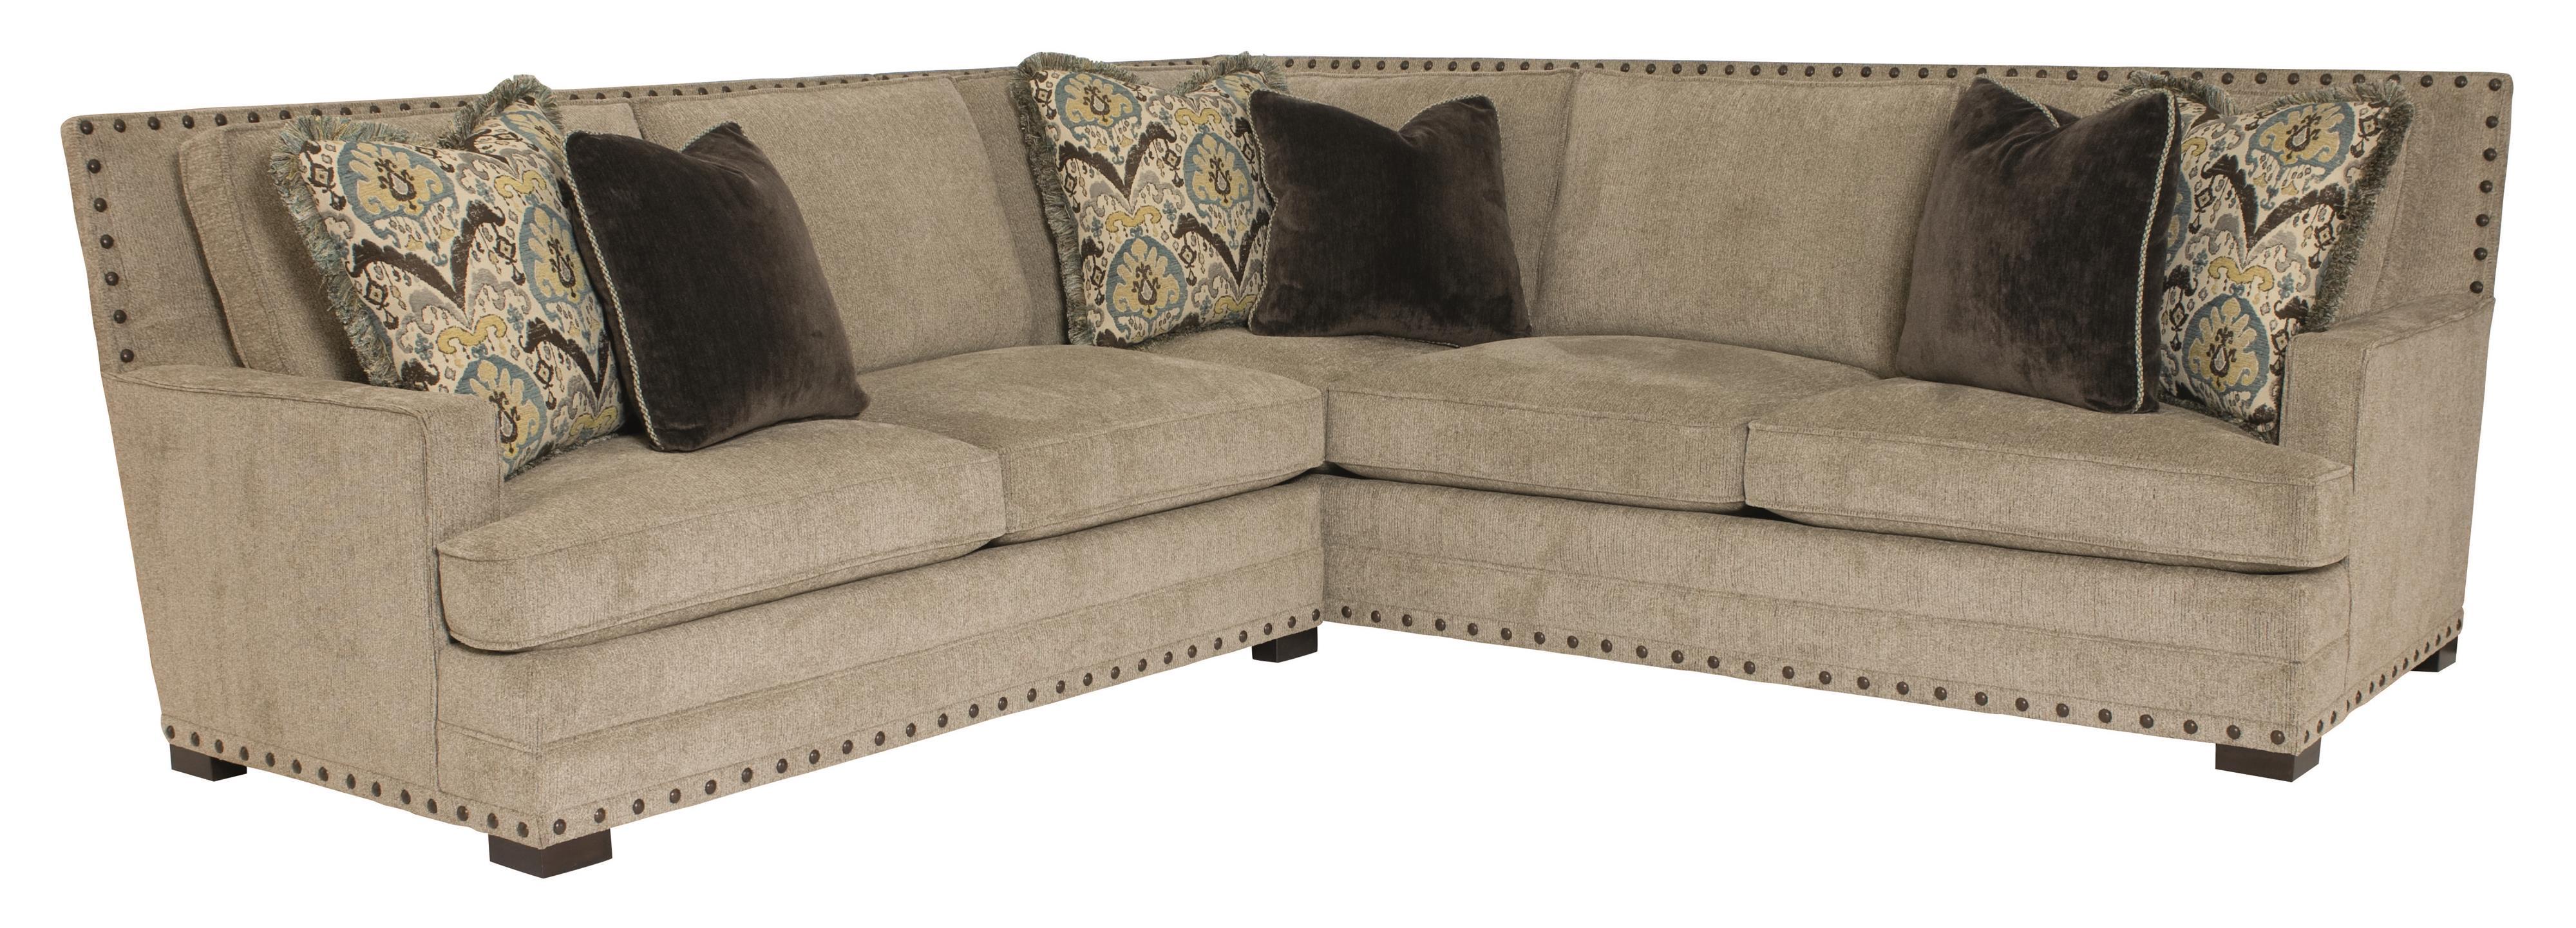 Bernhardt Cantor Sectional Sofa Dunk Amp Bright Furniture